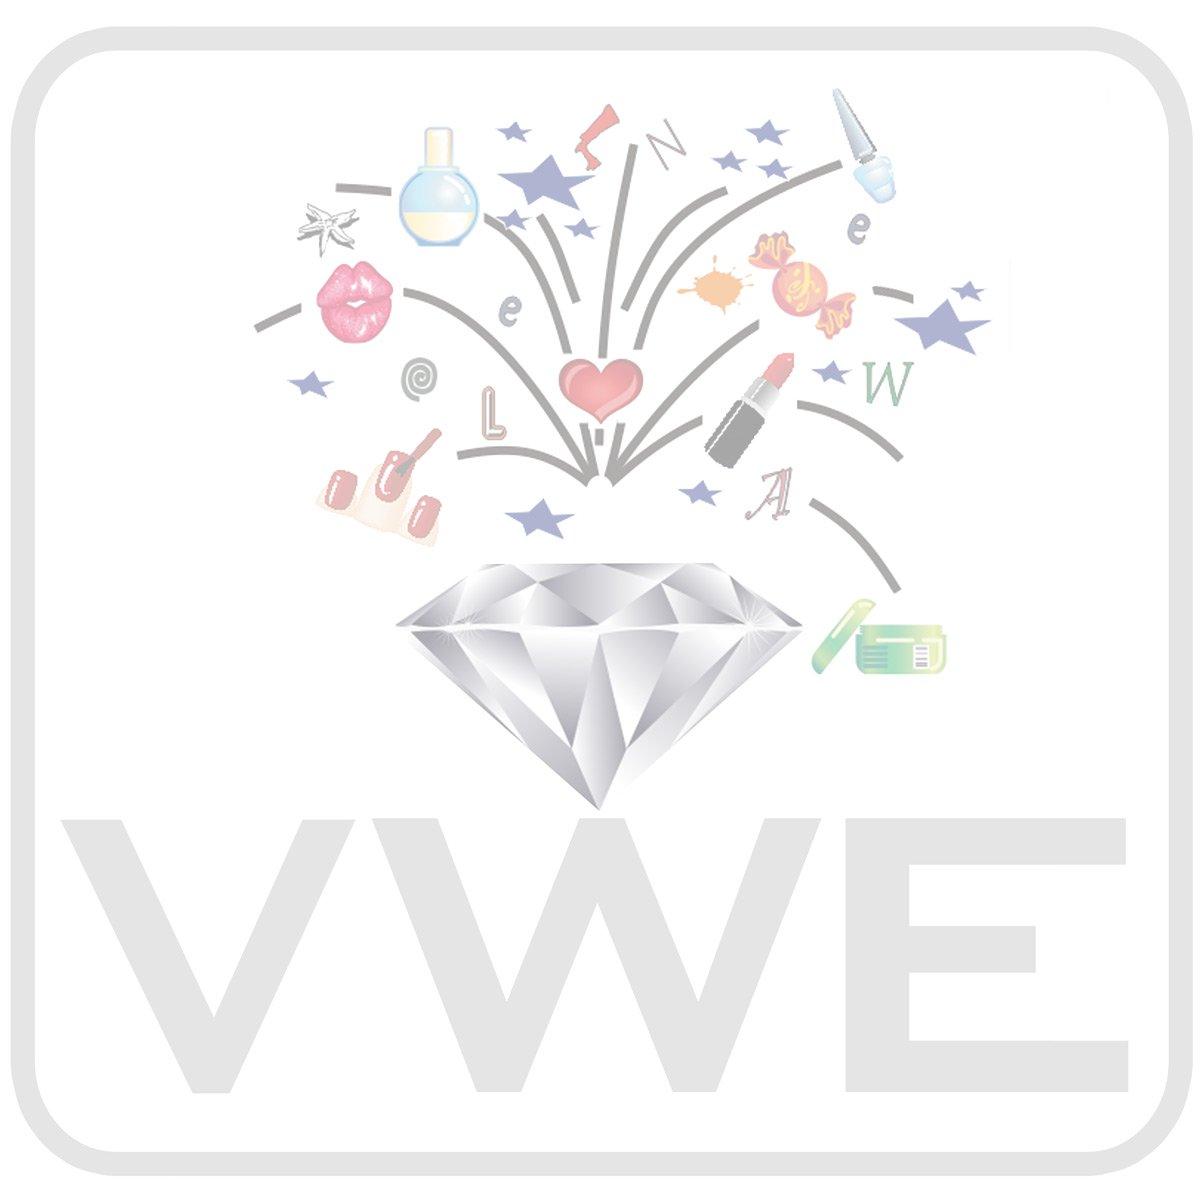 UV Gel Crystal Crush, 5ml  [1 / 10]